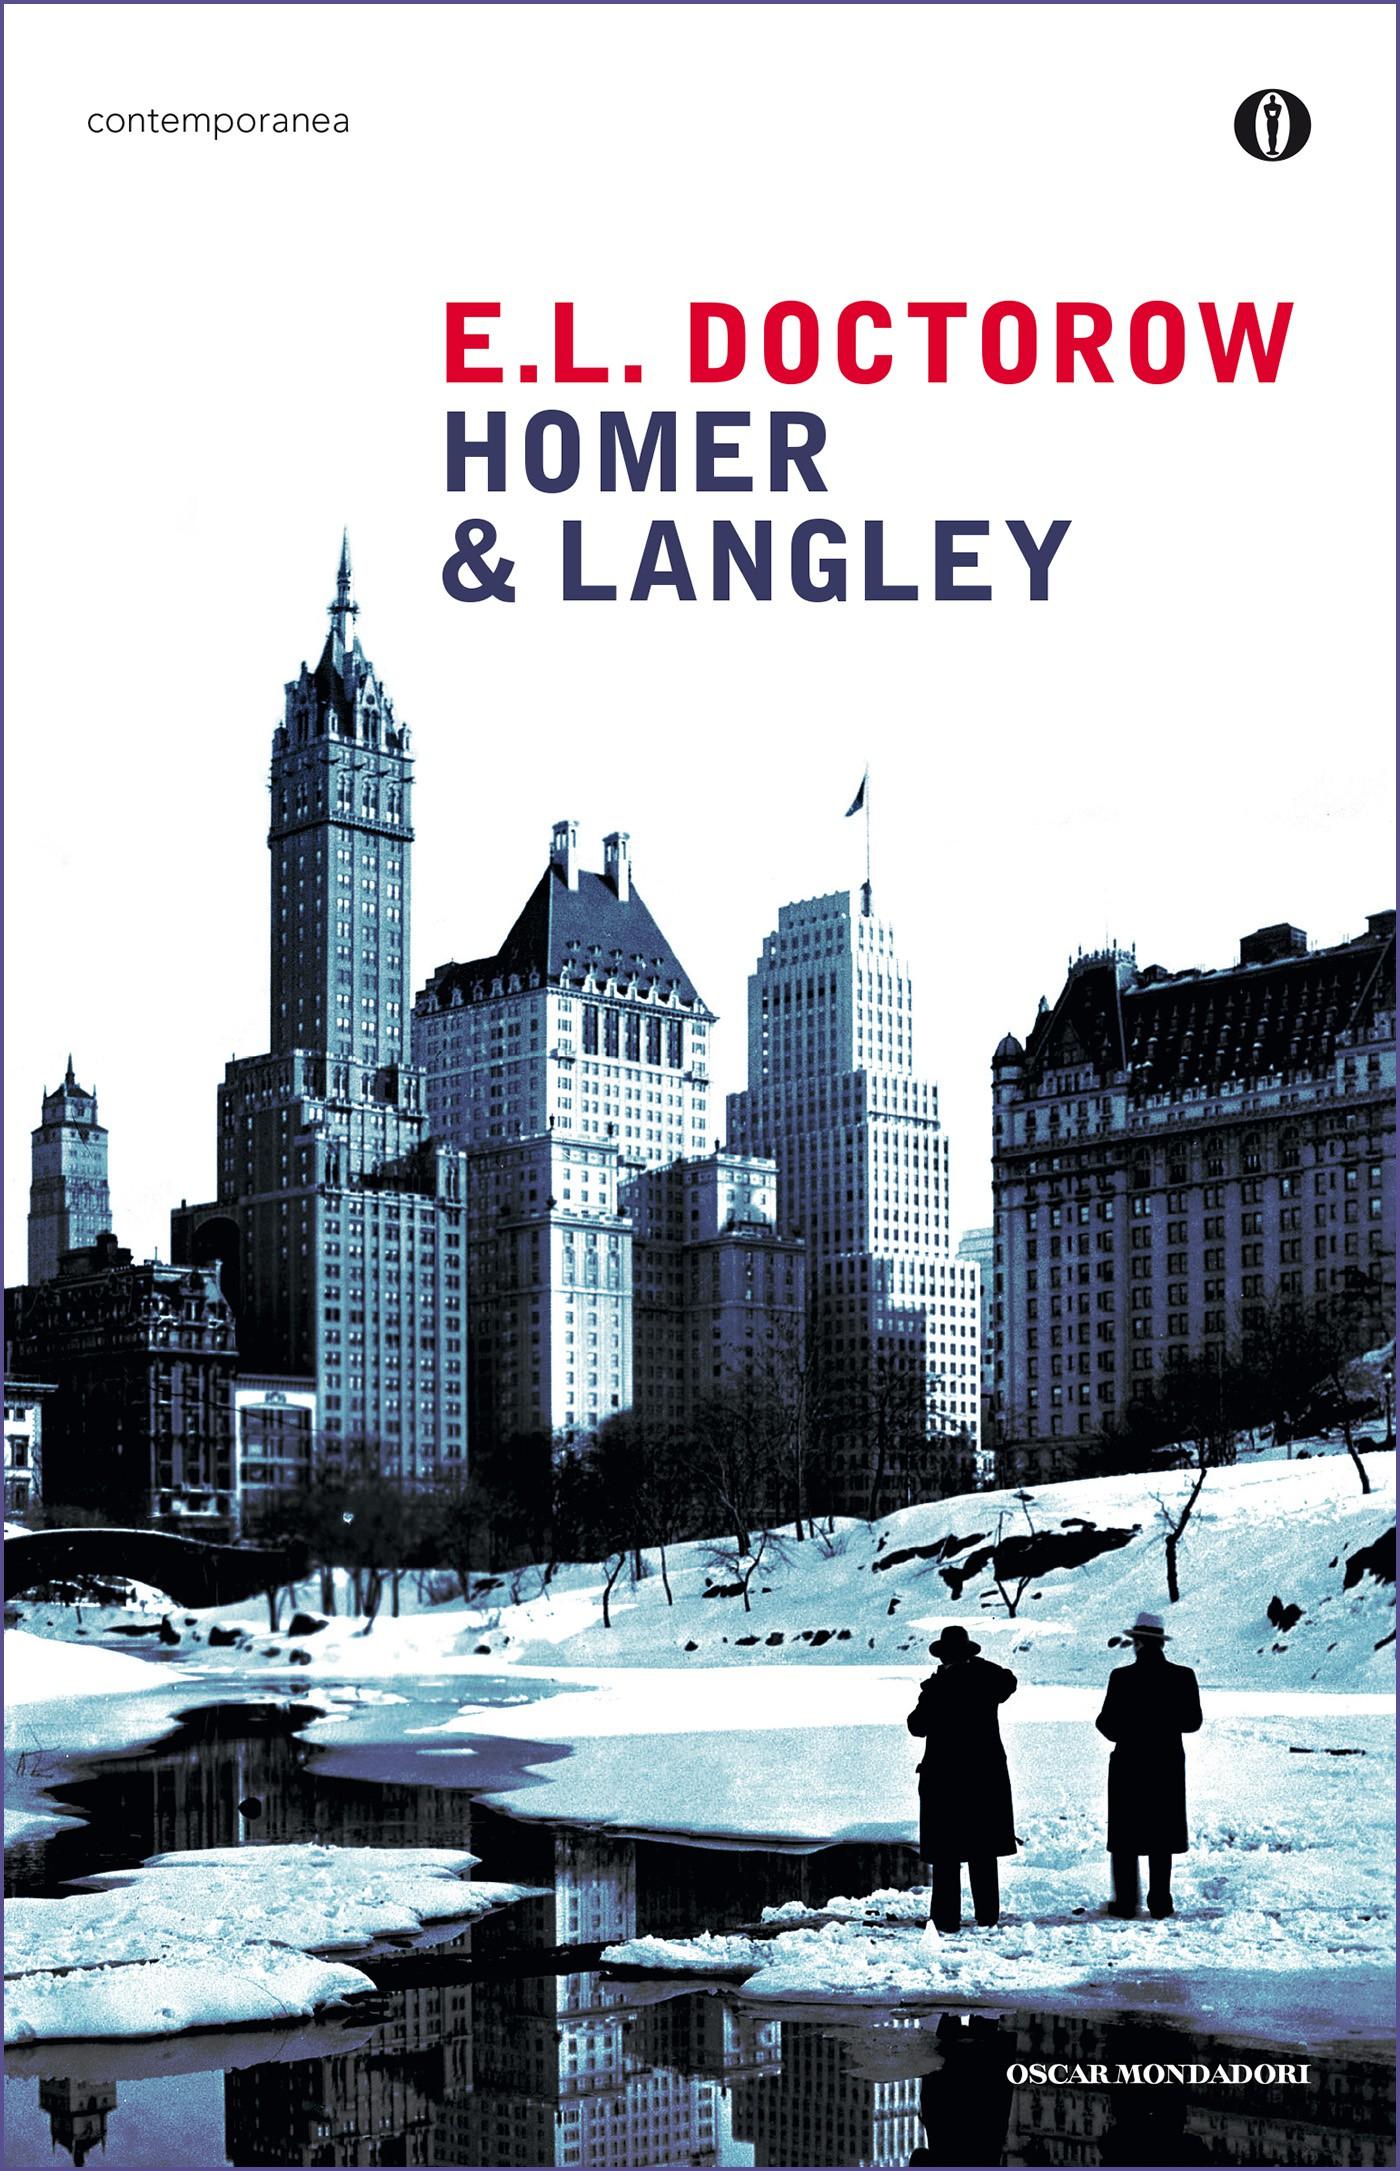 E.L. Doctorow, Homer & Langley, Mondadori